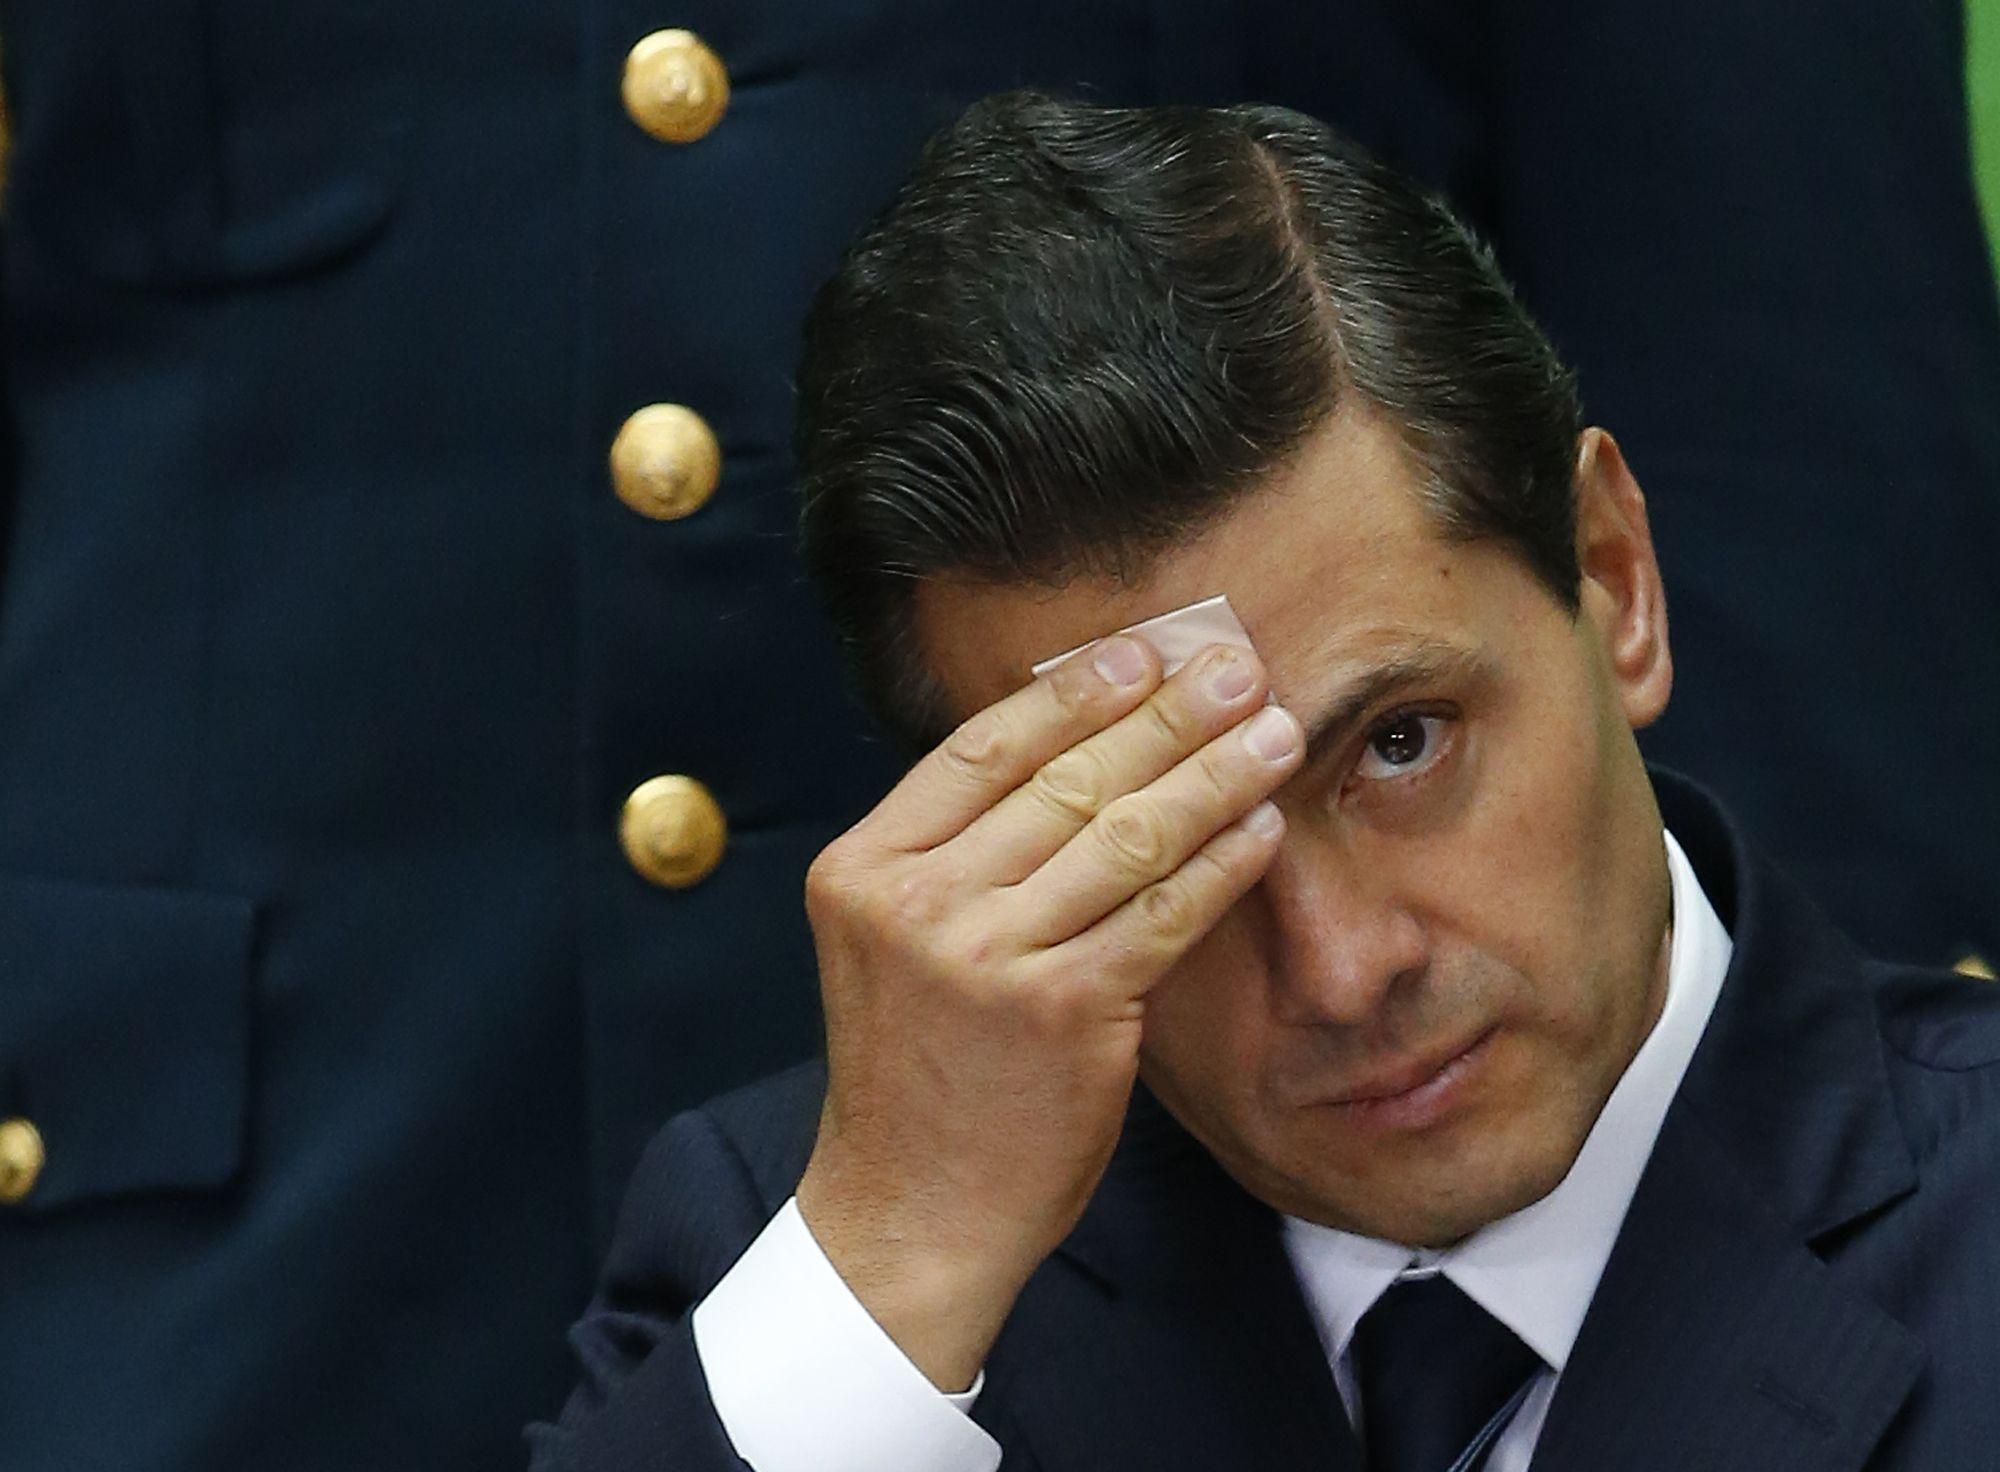 México: Conflicto en Senado por investigación de corrupción